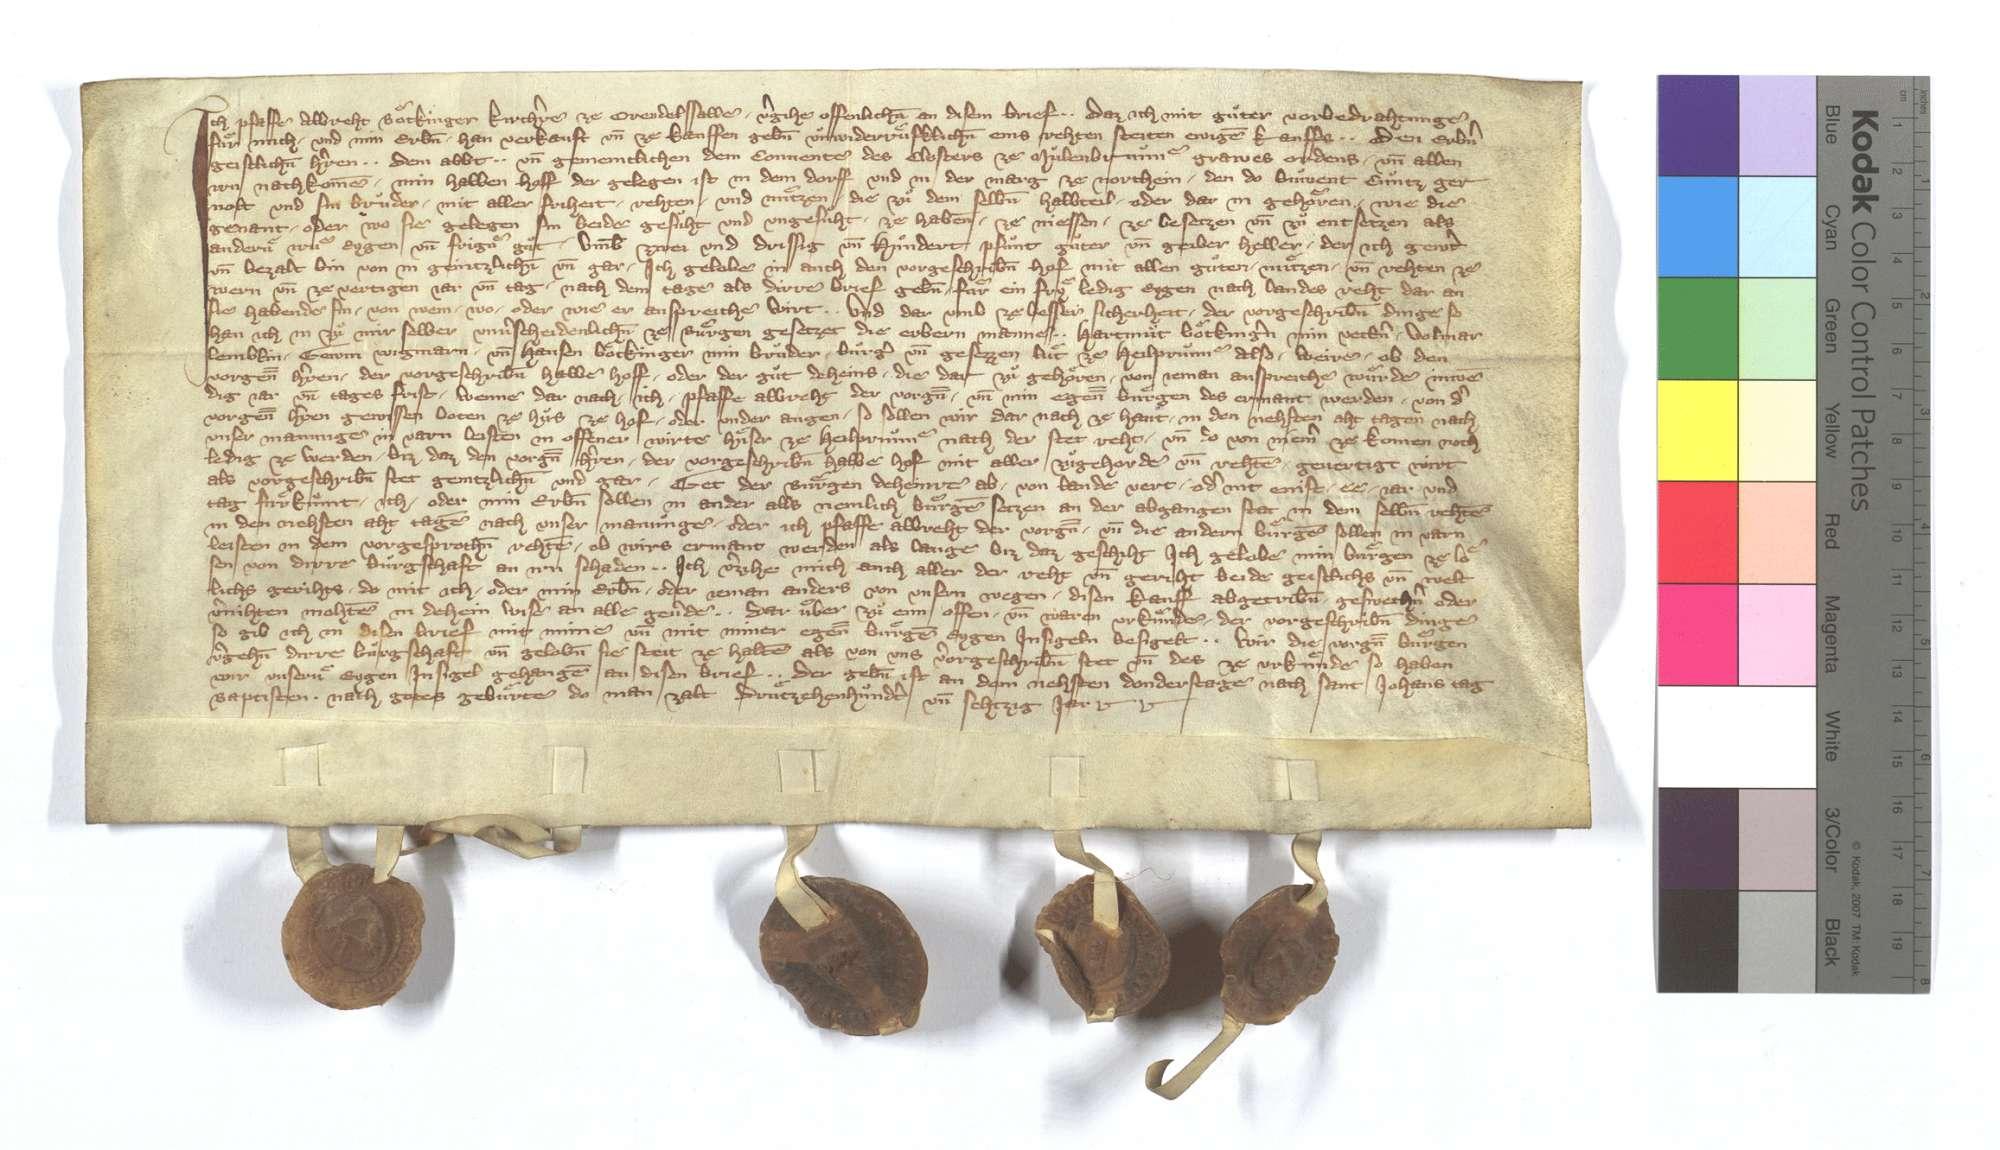 Albrecht Böckinger, Kirchherr von Orendelsall (Orendelsol), verkauft dem Kloster Maulbronn seinen halben Hof in Nordheim (Northeim)., Text